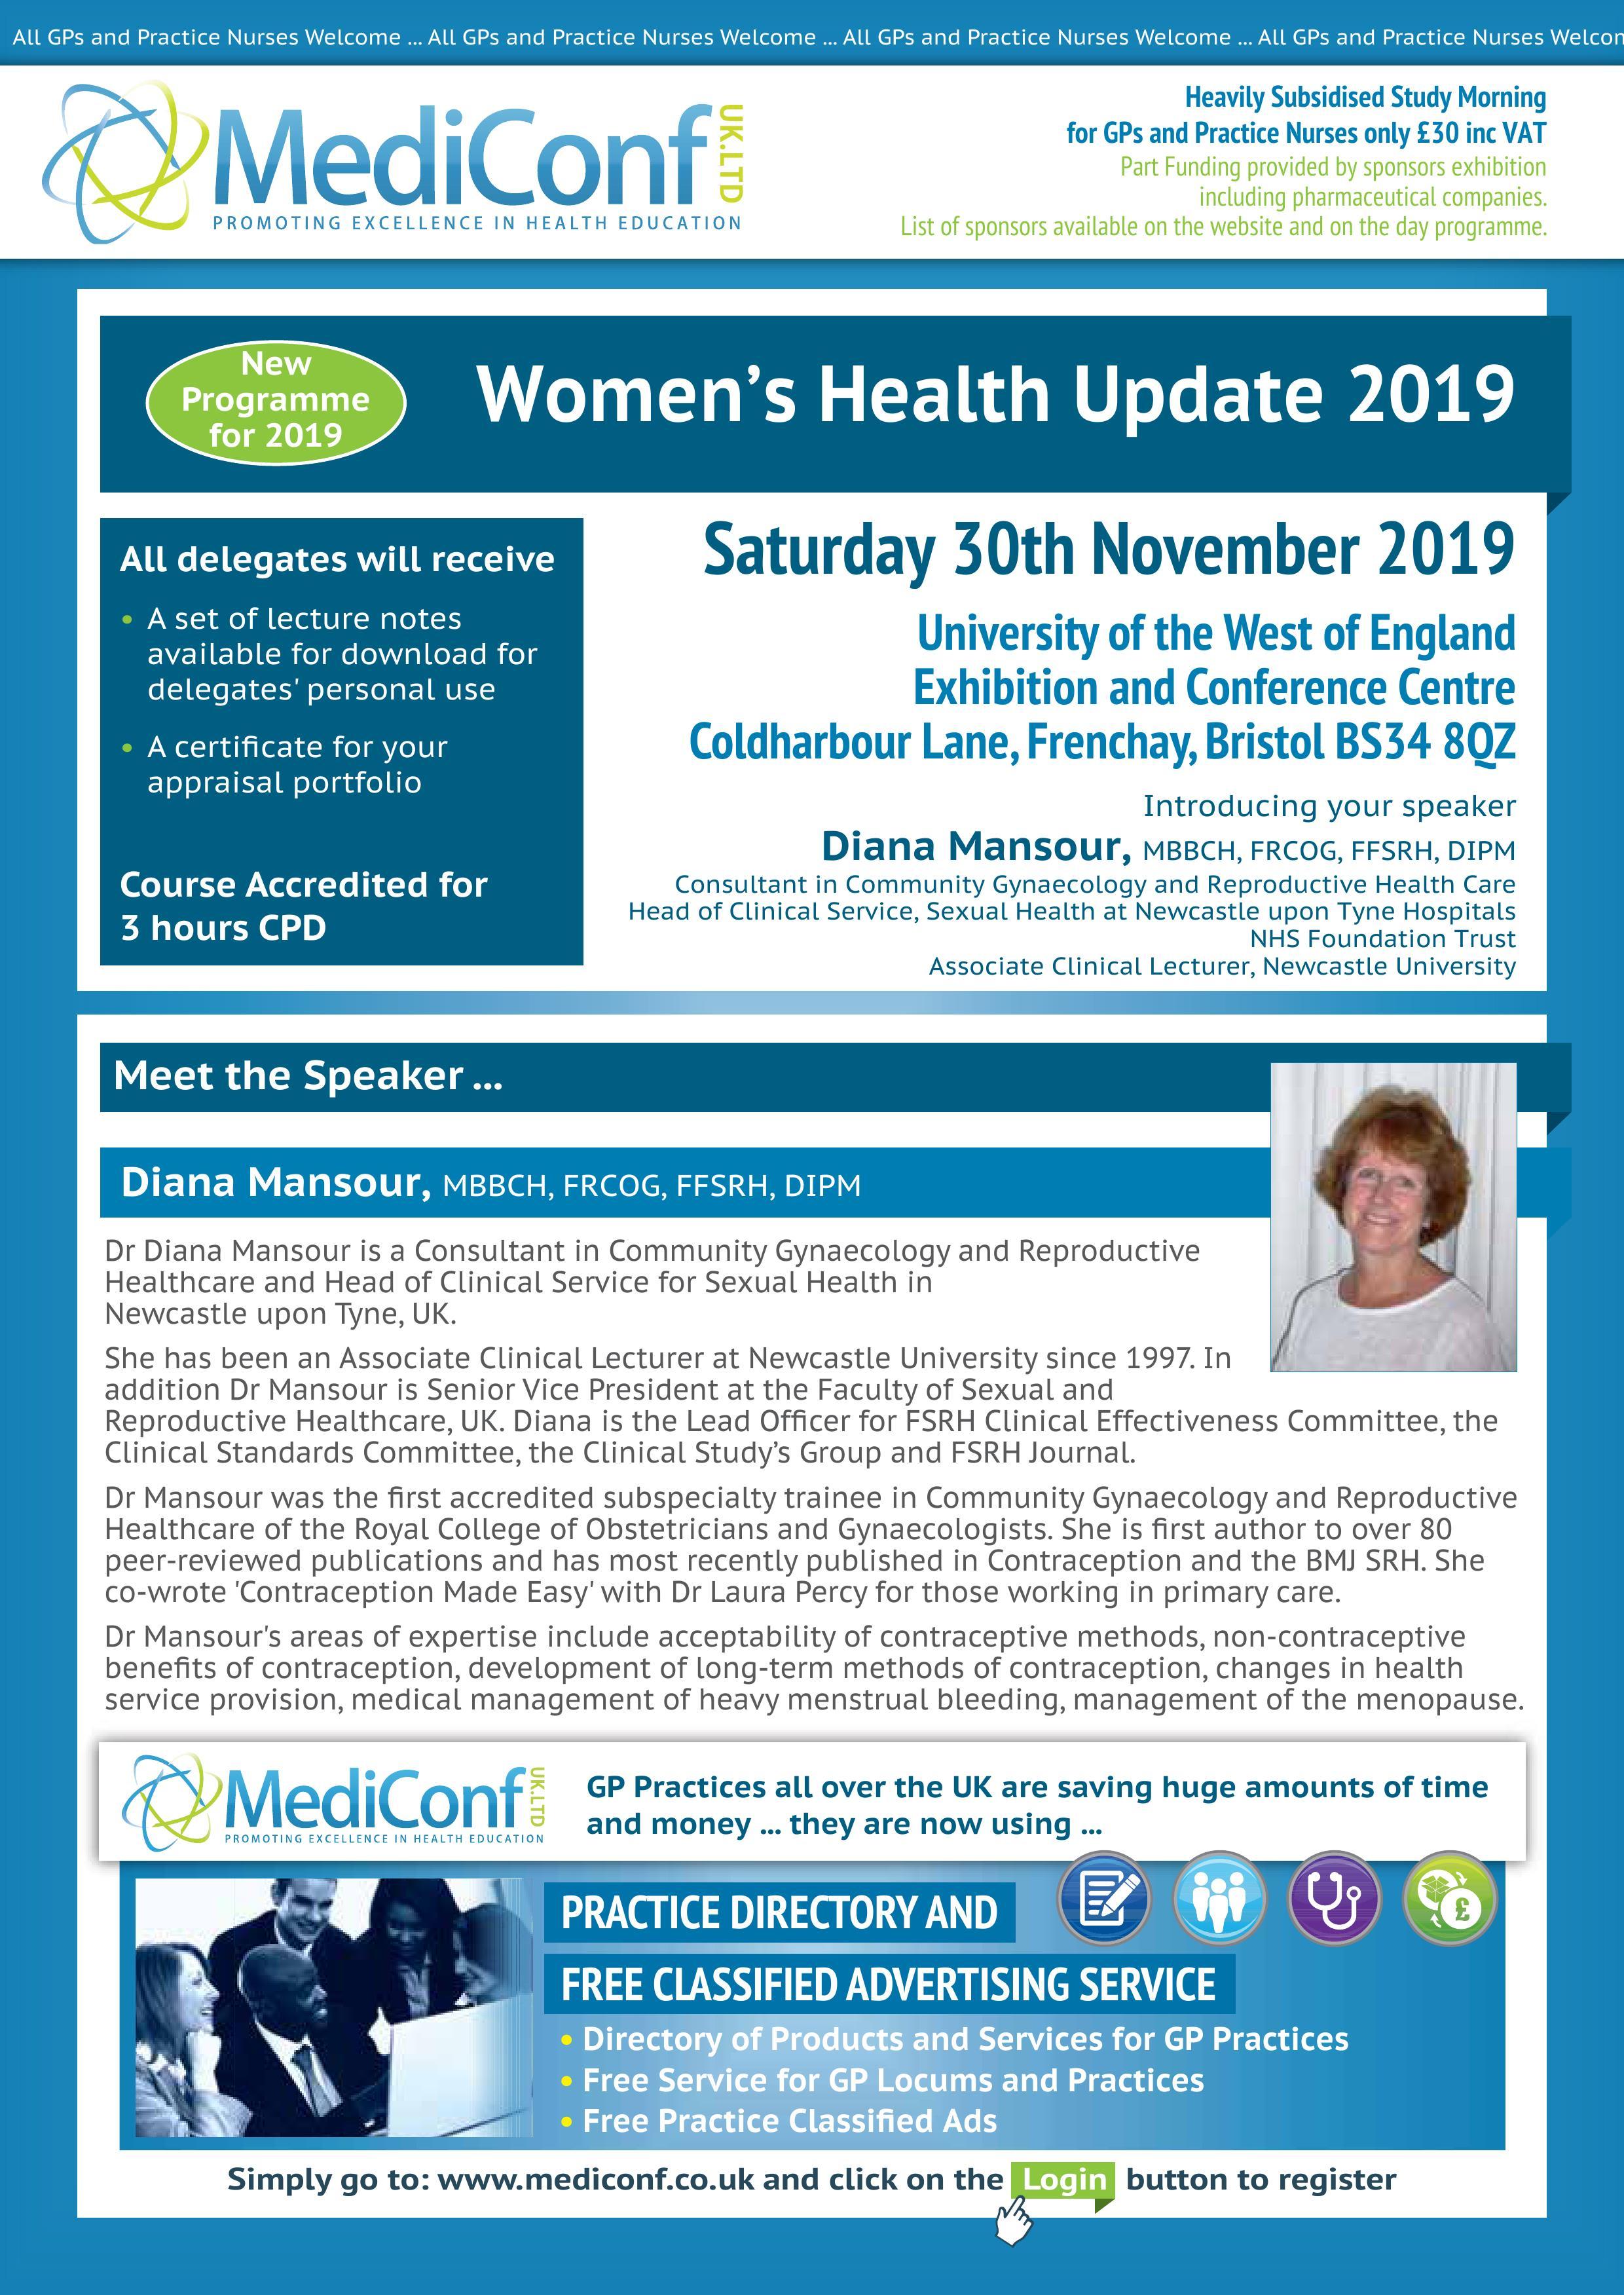 Women's Health Update 2019 - 30 November 2019 | MediConf